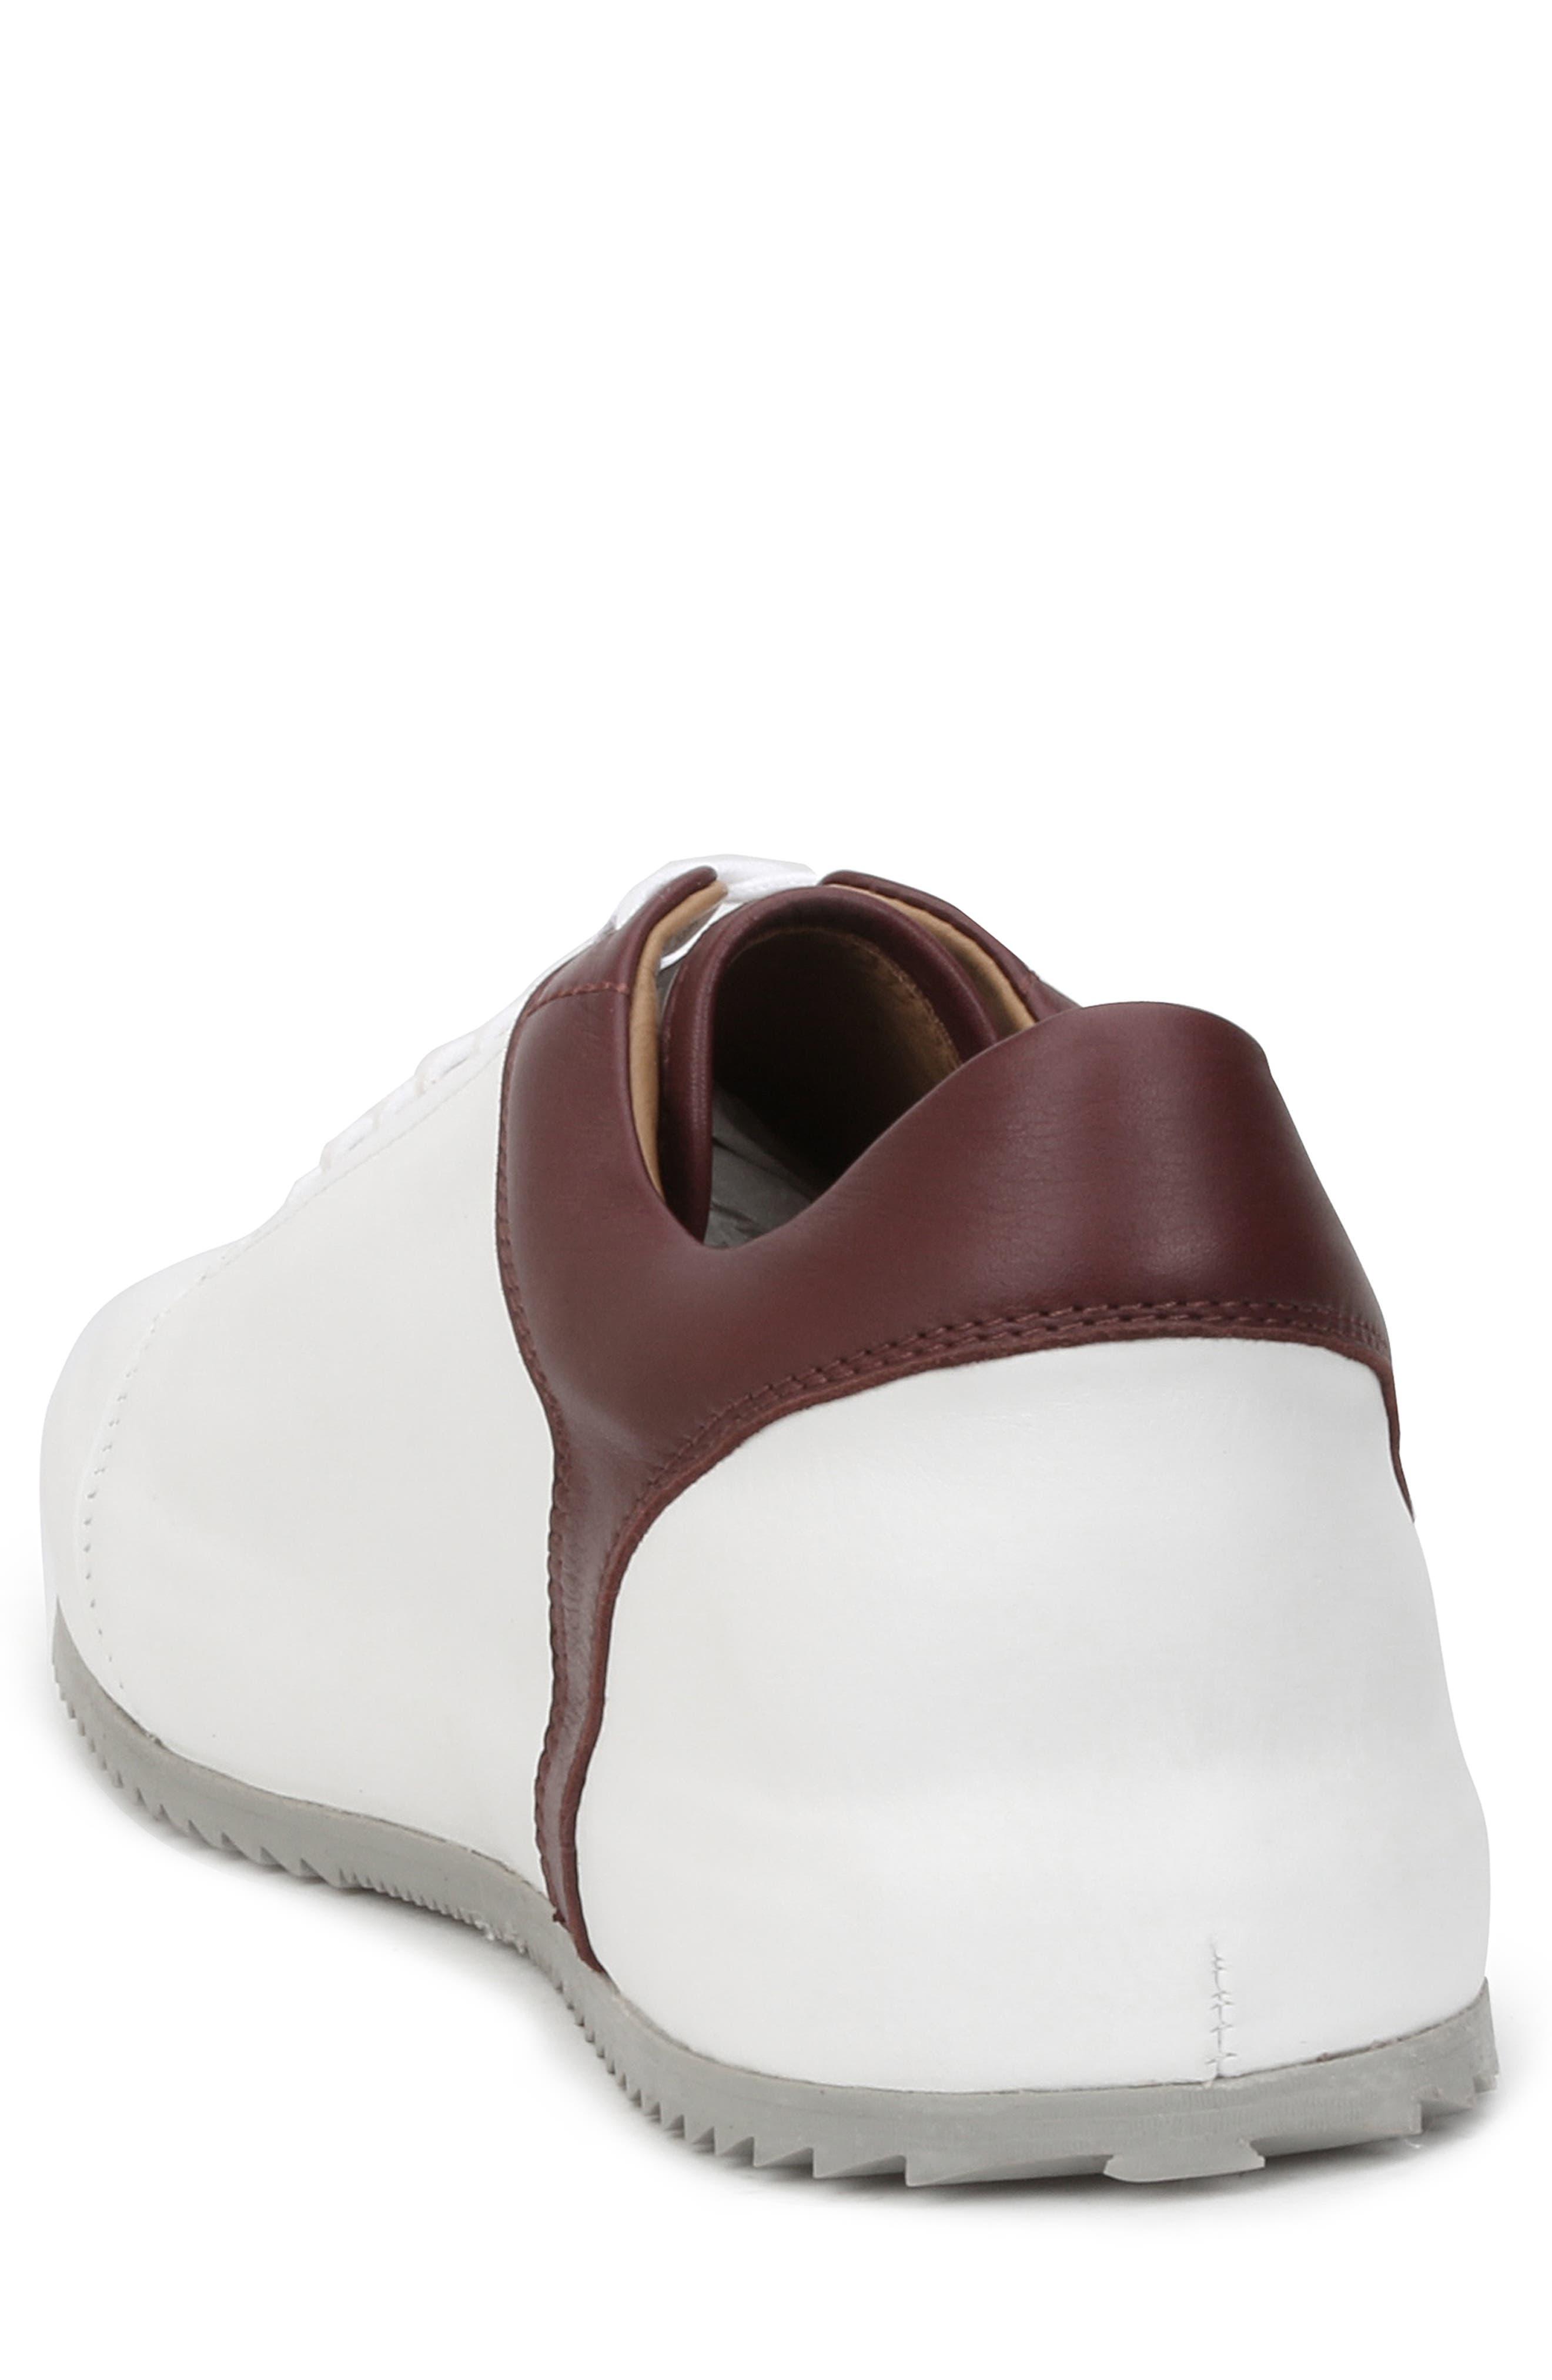 Santana Sneaker,                             Alternate thumbnail 2, color,                             WHITE/ BORDEAUX